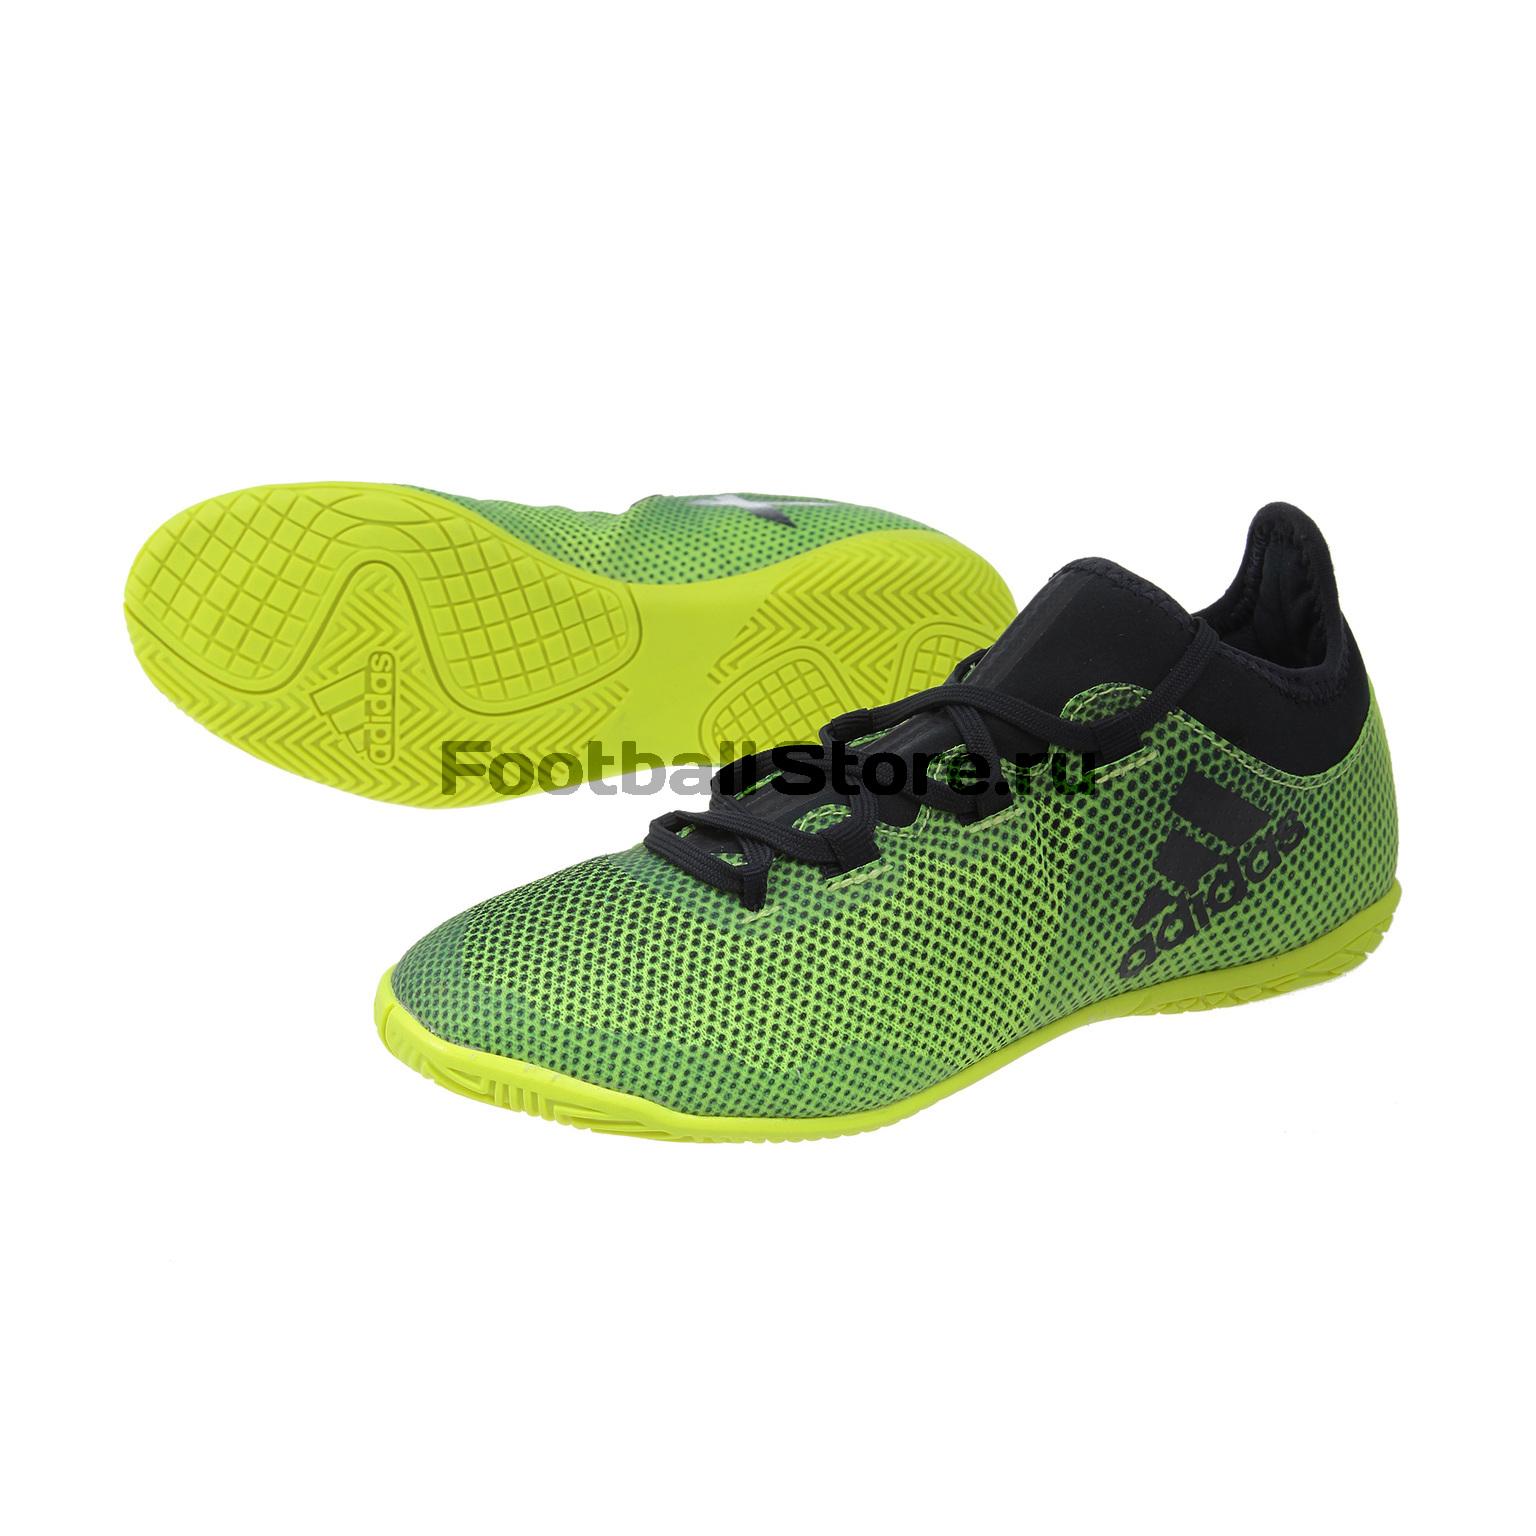 Обувь для зала Adidas X Tango 17.3 IN JR CG3723 обувь для зала adidas nemeziz tango 17 3 in jr cp9182